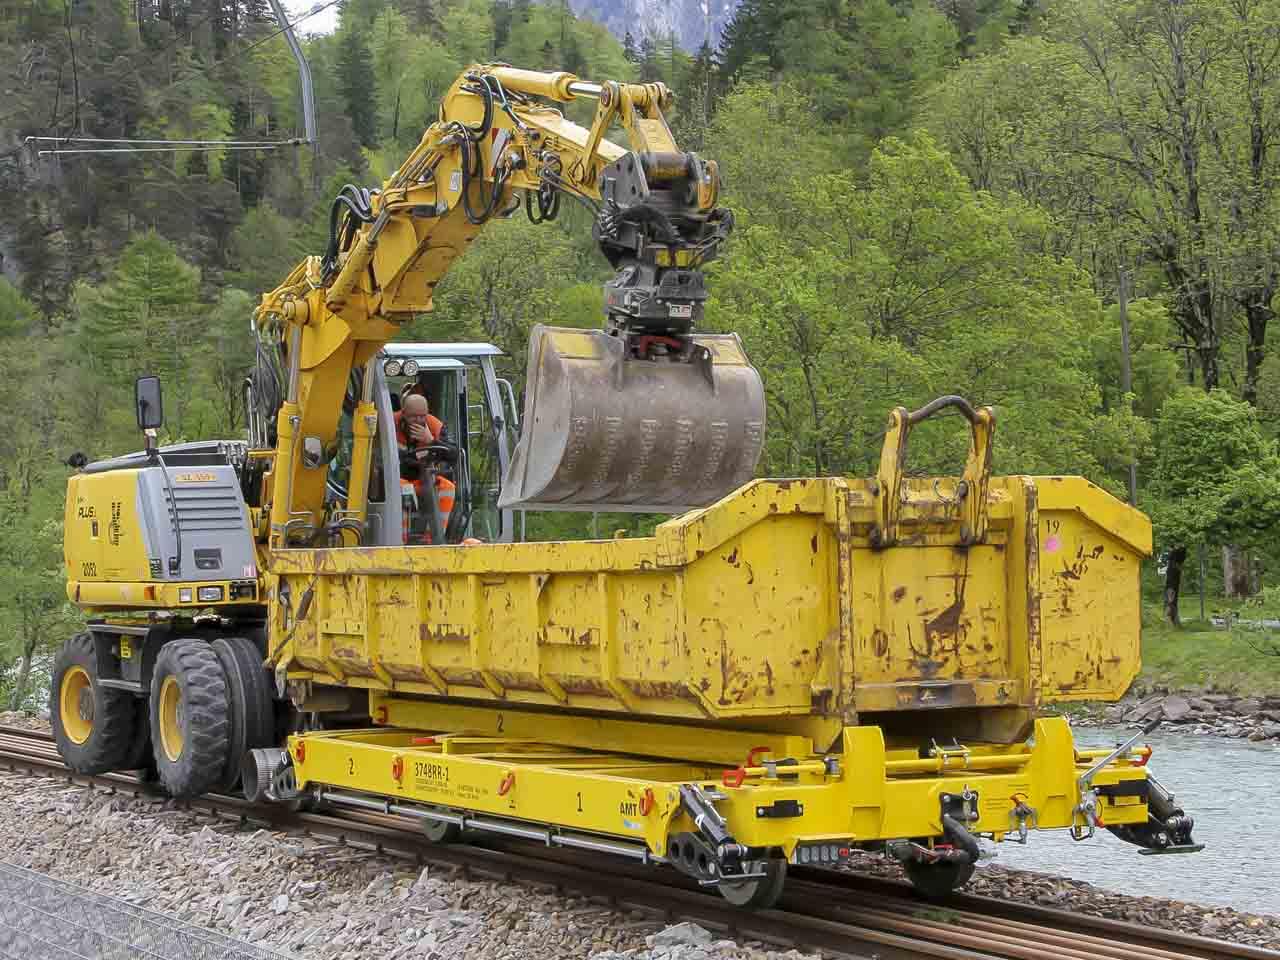 Railtrailers (Flatlorries)